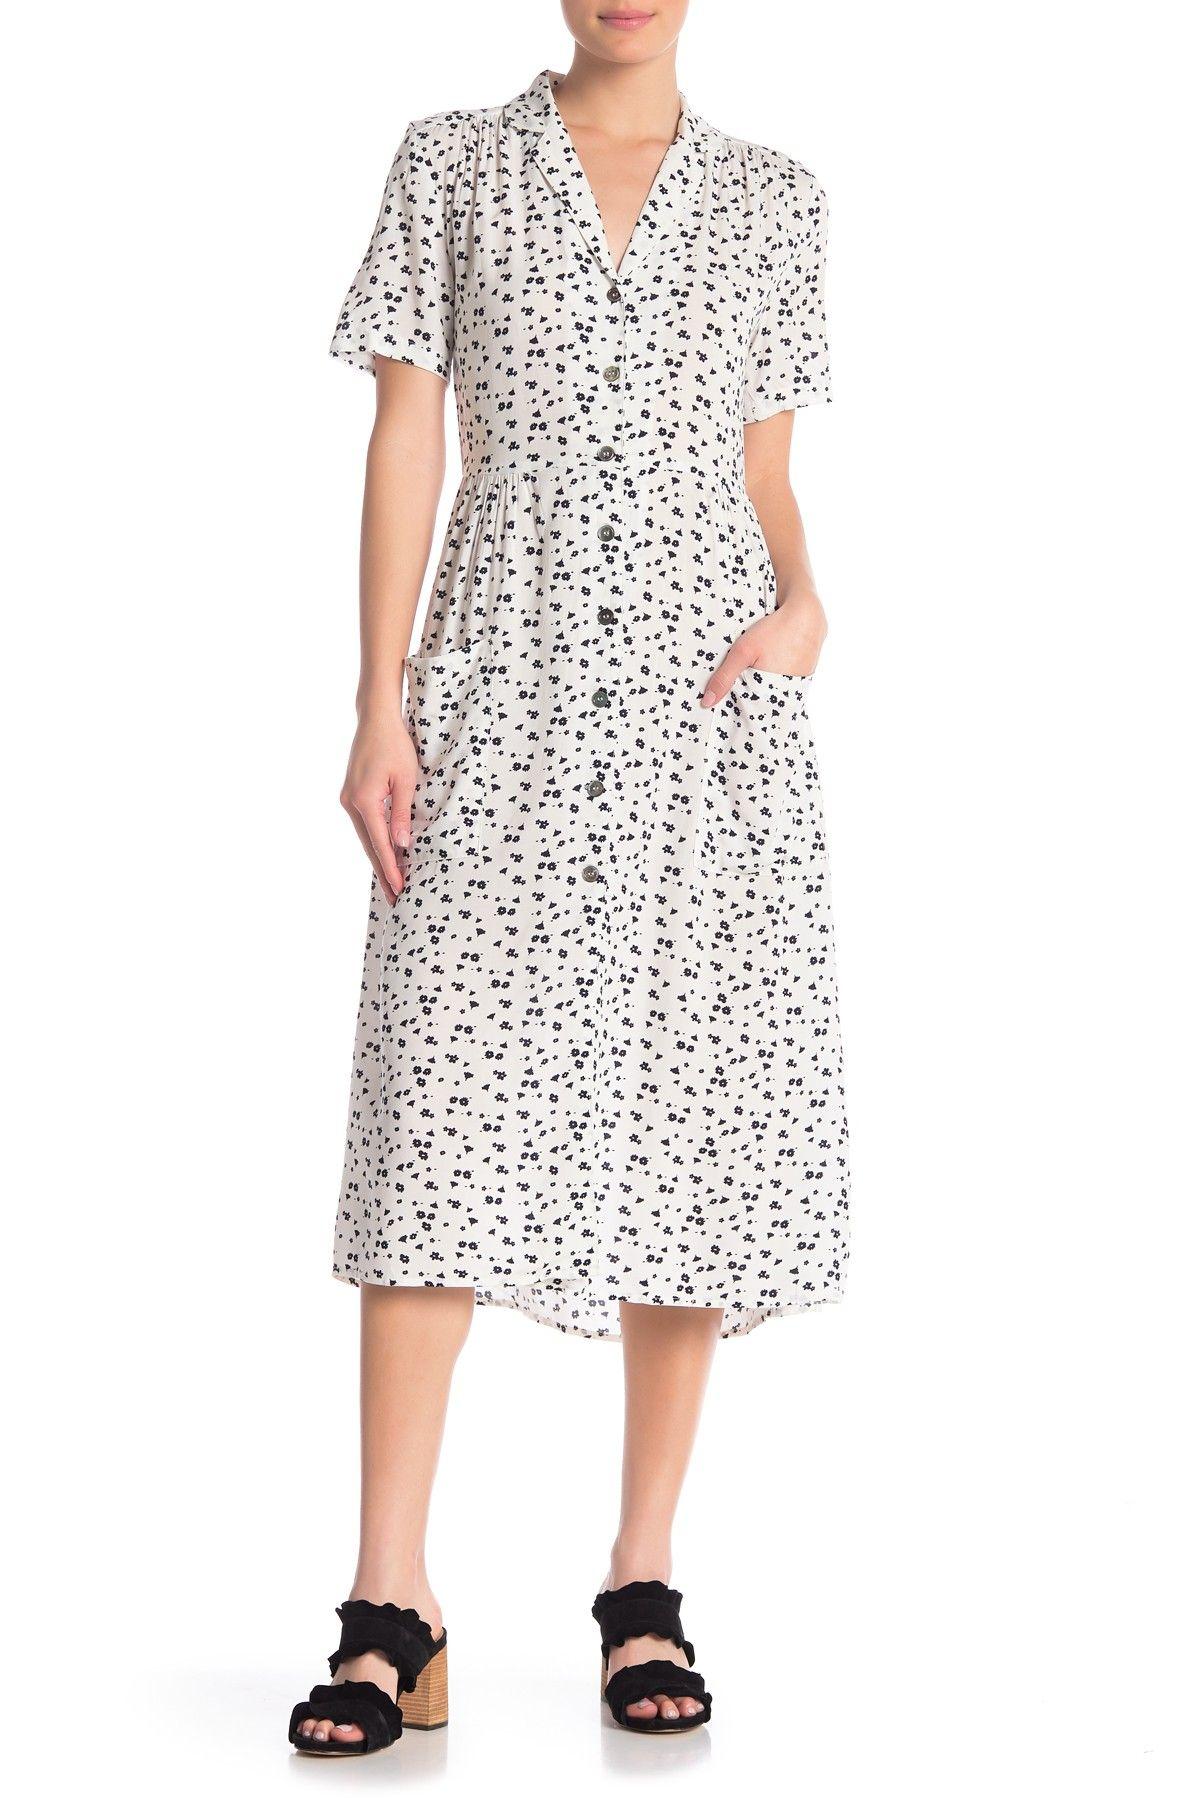 Cloth By Design Printed Collared Midi Dress Nordstrom Rack Dresses Midi Dress Clothes [ 1800 x 1200 Pixel ]